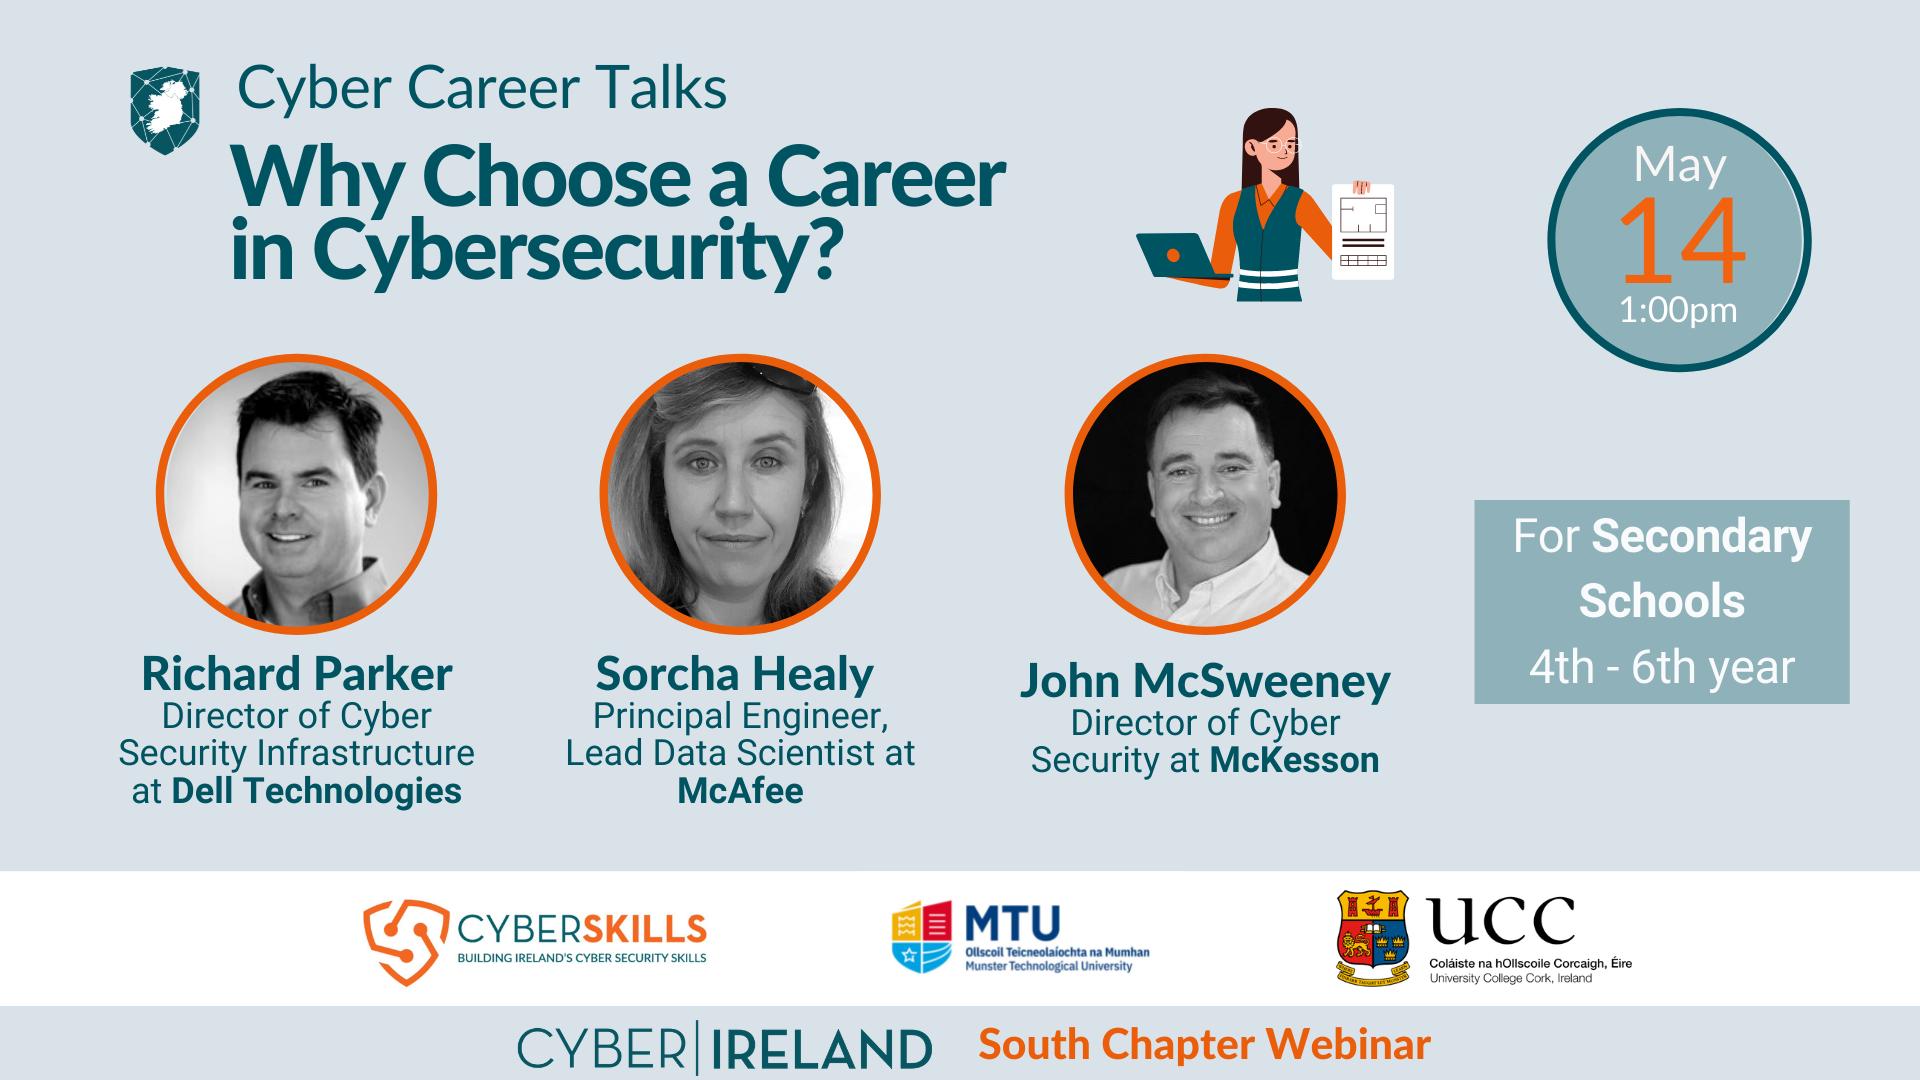 Cyber Career Talks